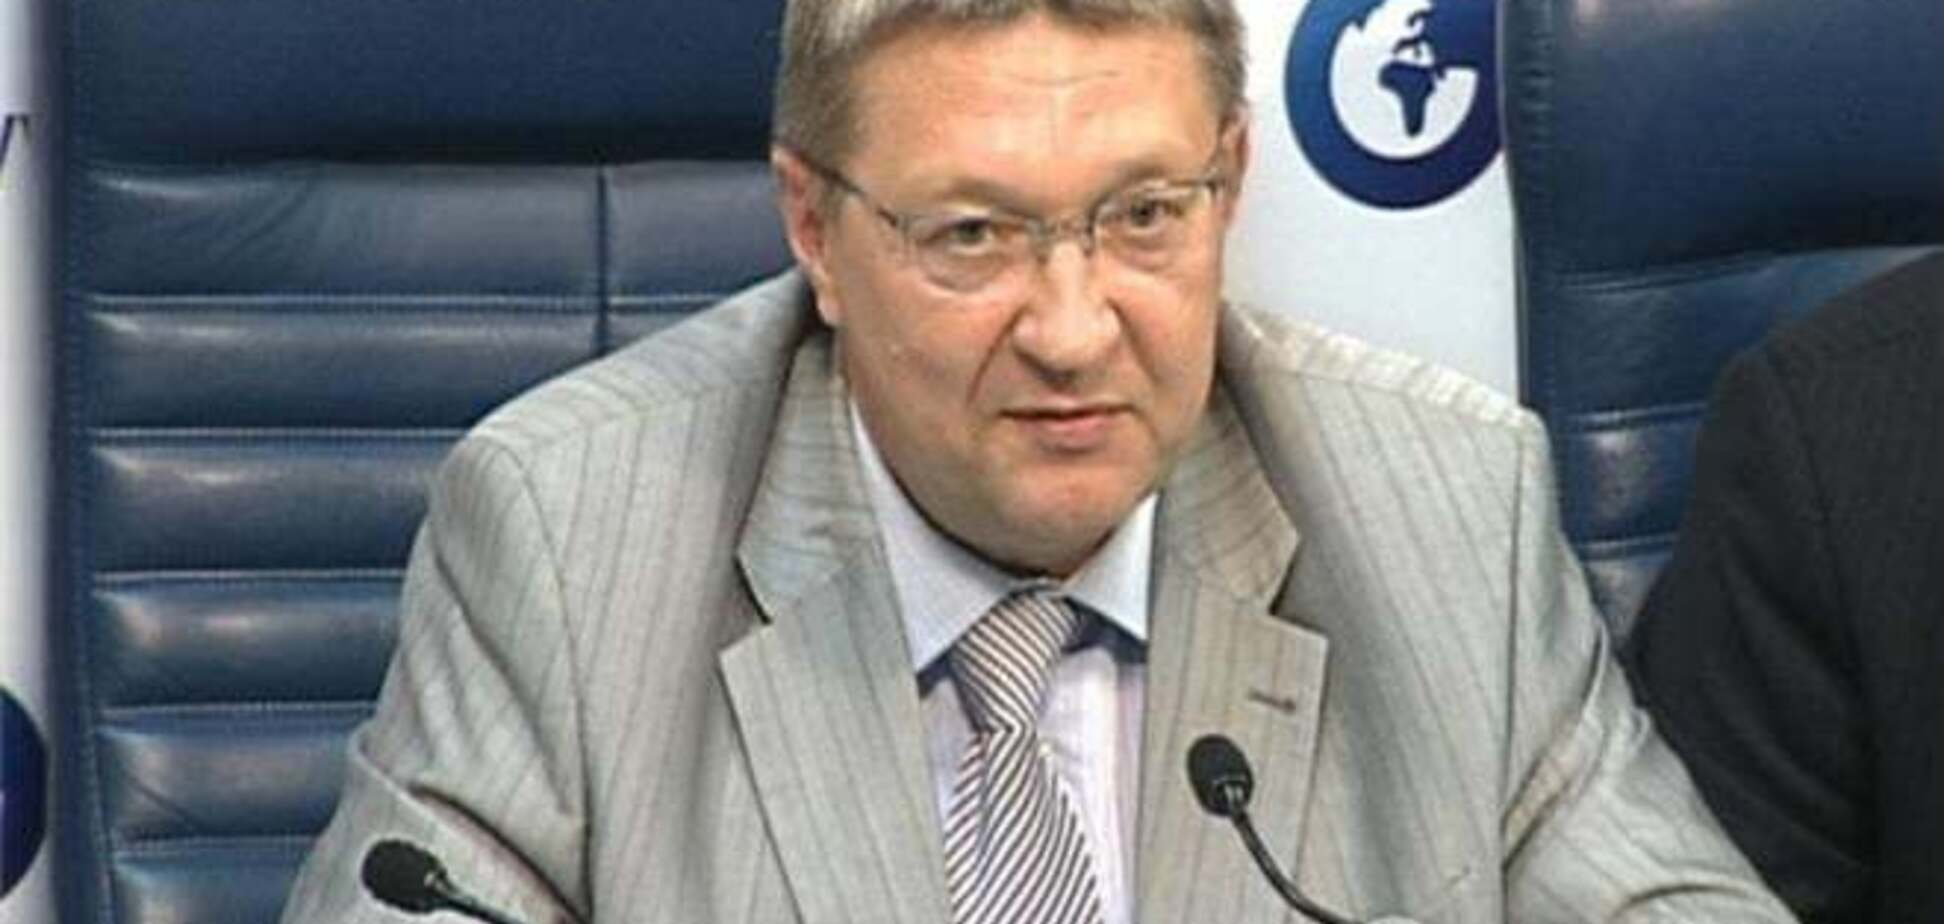 Економіст про загрози Медведєва: є невелика проблема